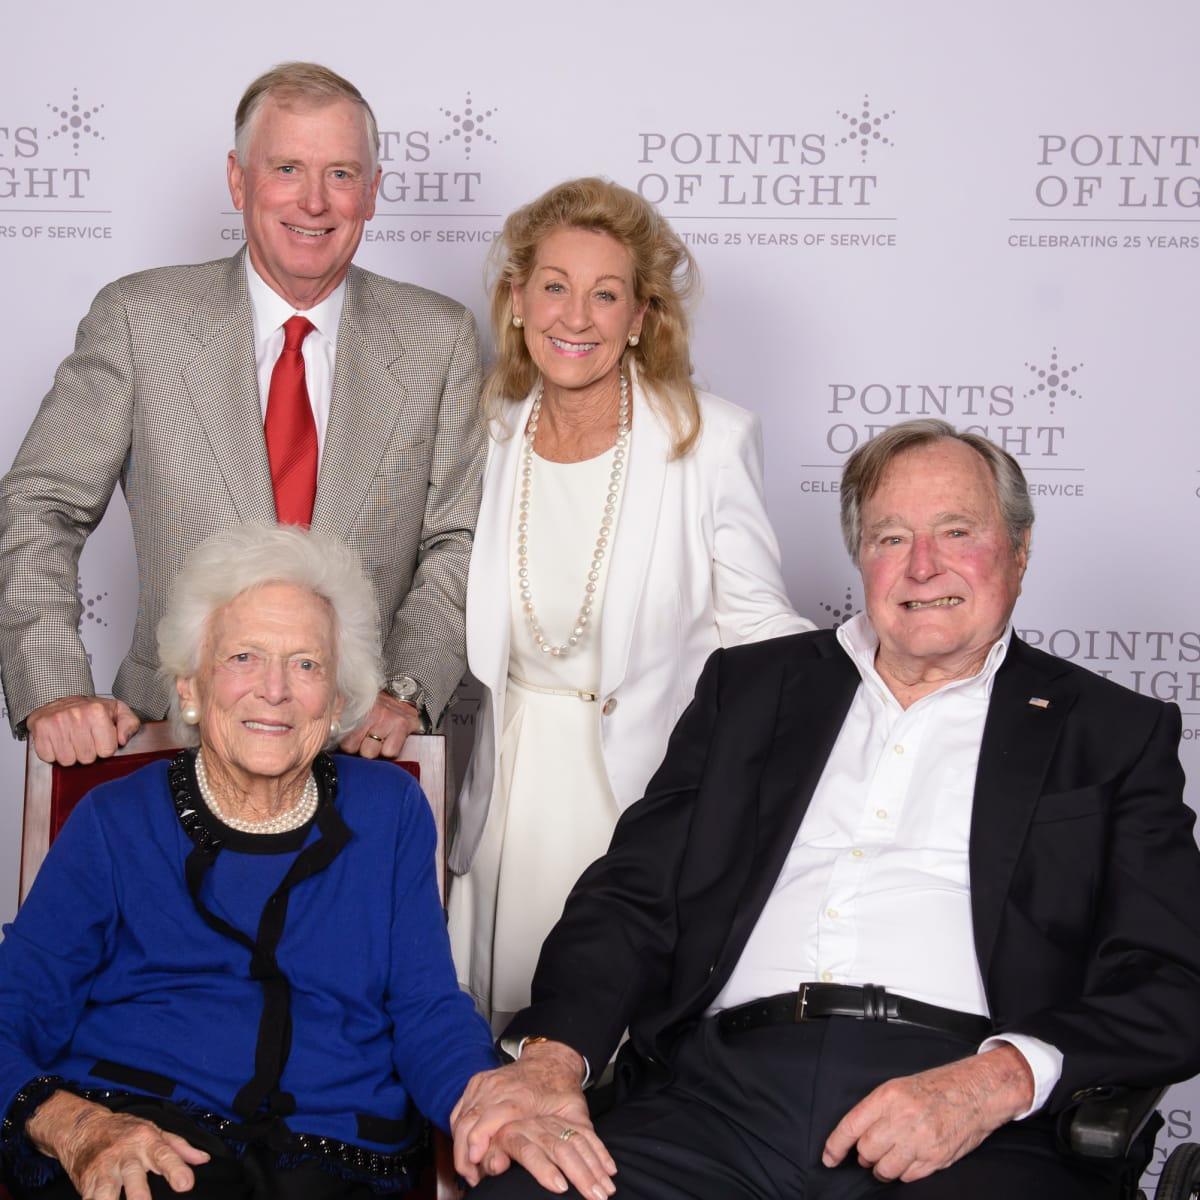 News, Shelby, Points of Light Tribute, Oct. 2015, Barbara Bush, Dan Quayle, Debi Rosling, George H. W. Bush